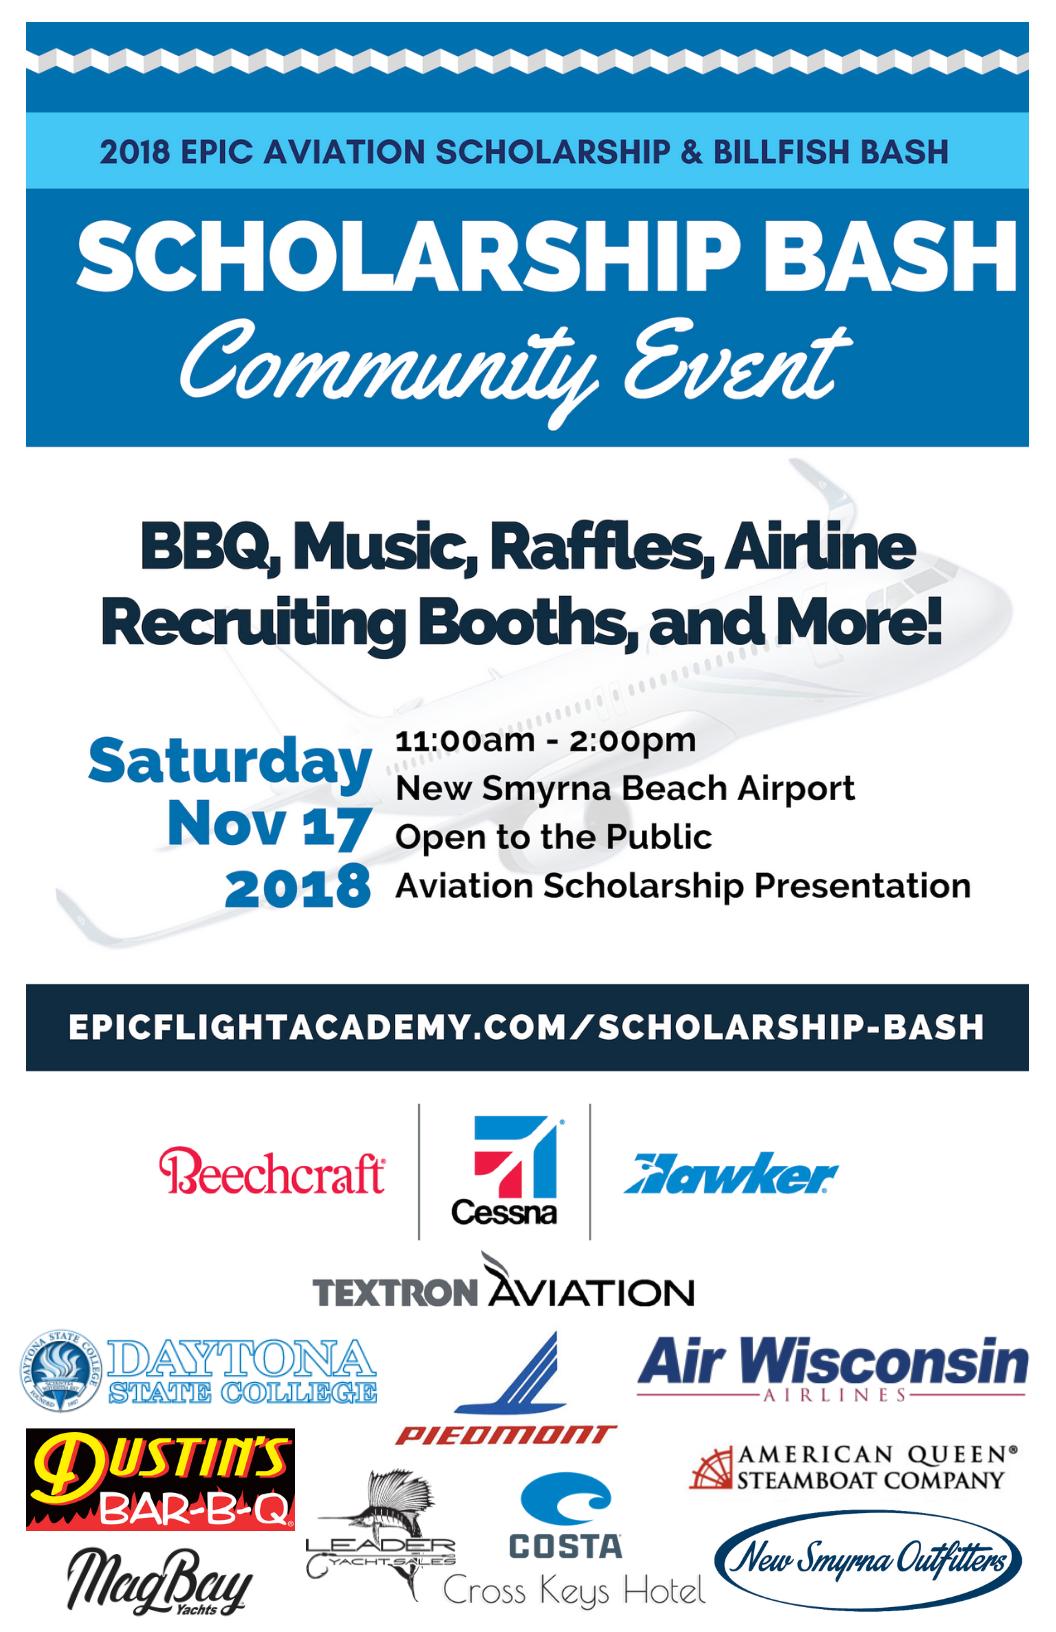 Epic Aviation Scholarship Scholarships Epic Aviation